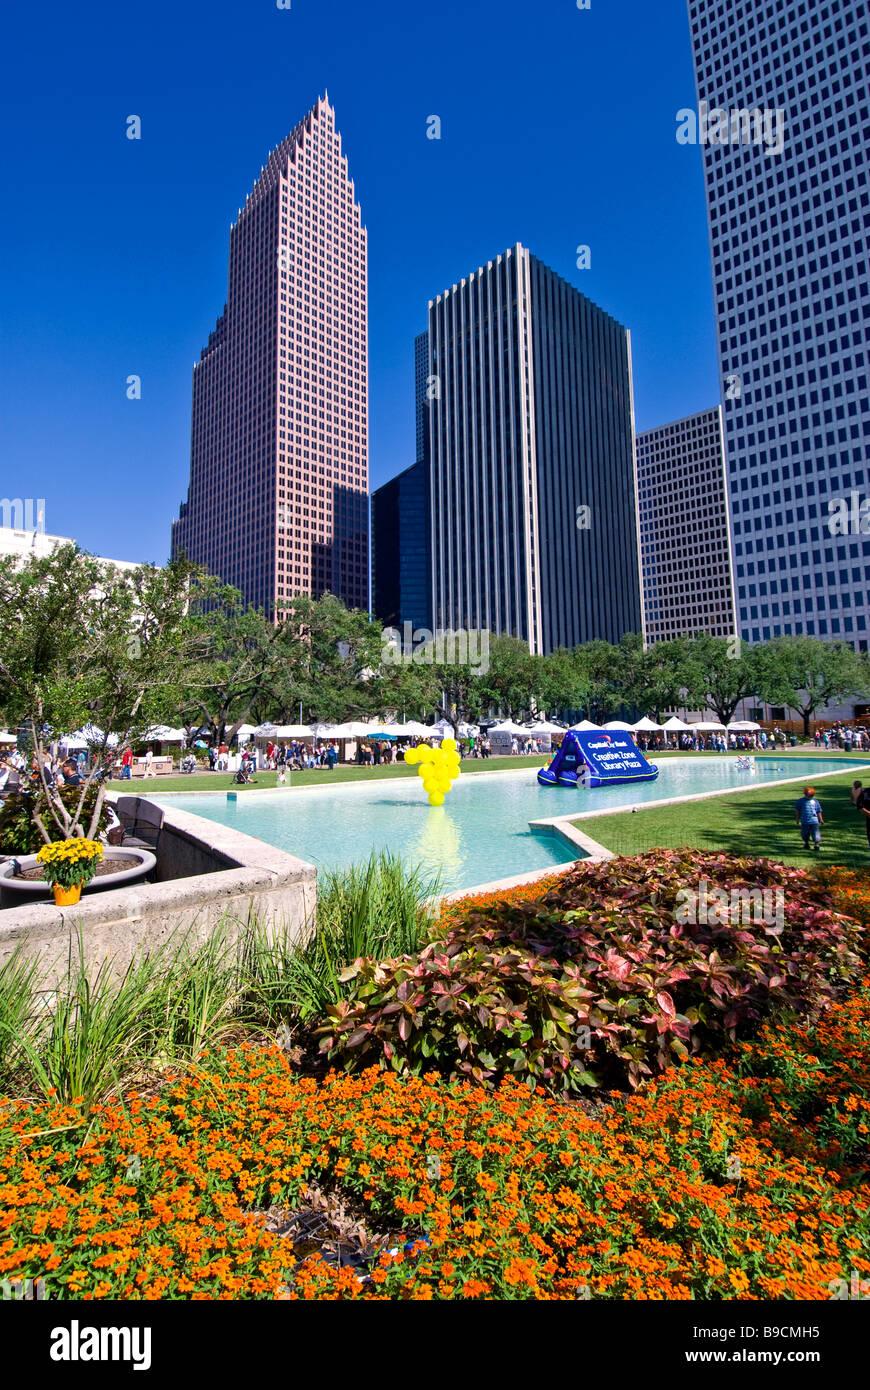 Rencontres gay dans Houston Texas